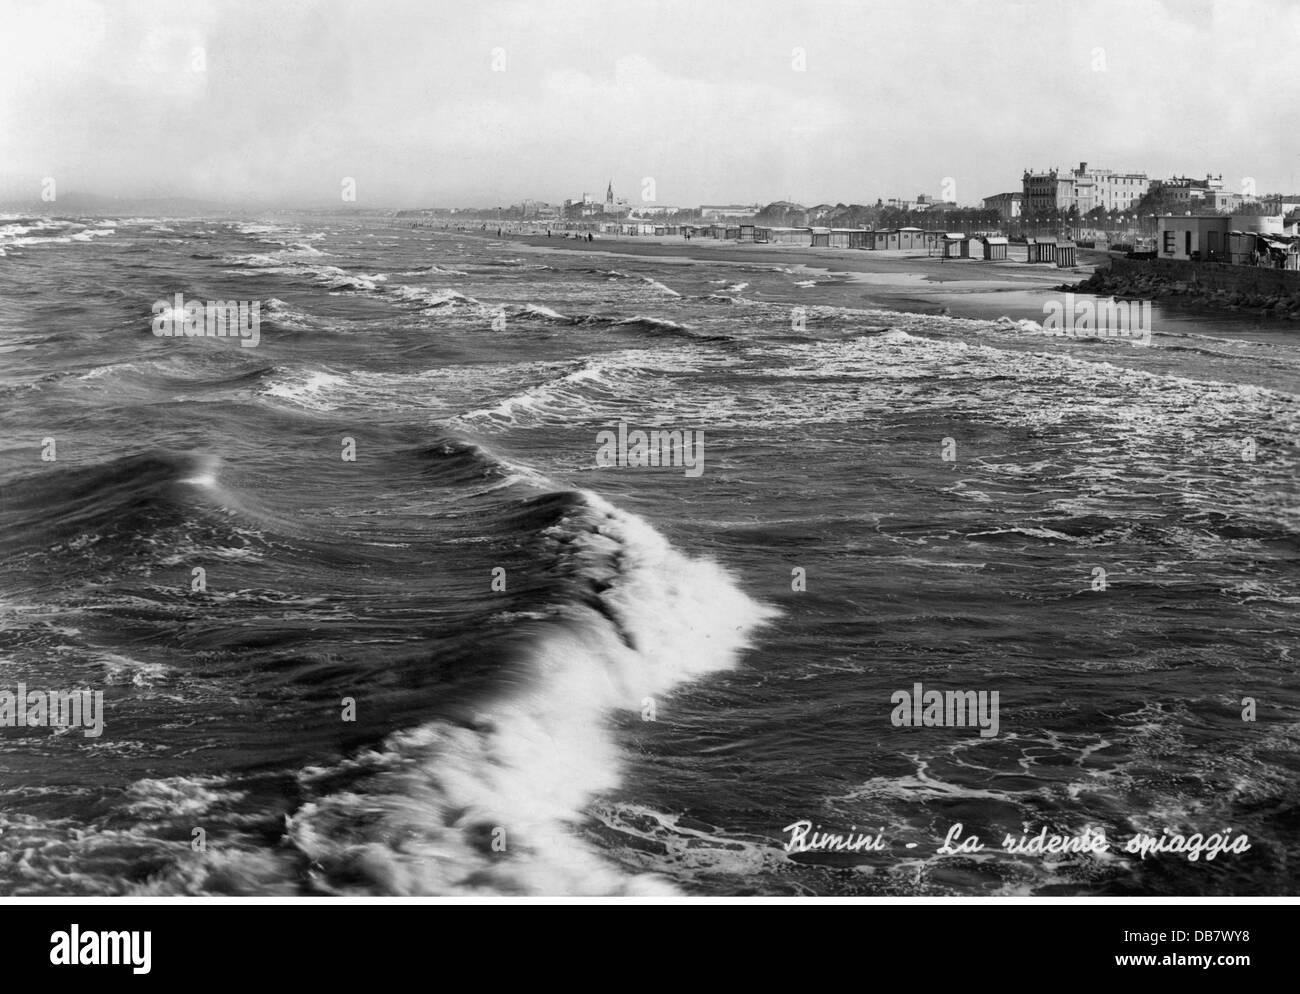 geography / travel, Italy, Rimini, city views / cityscapes, La ridente spiaggia, picture postcard, circa 1959, Additional - Stock Image